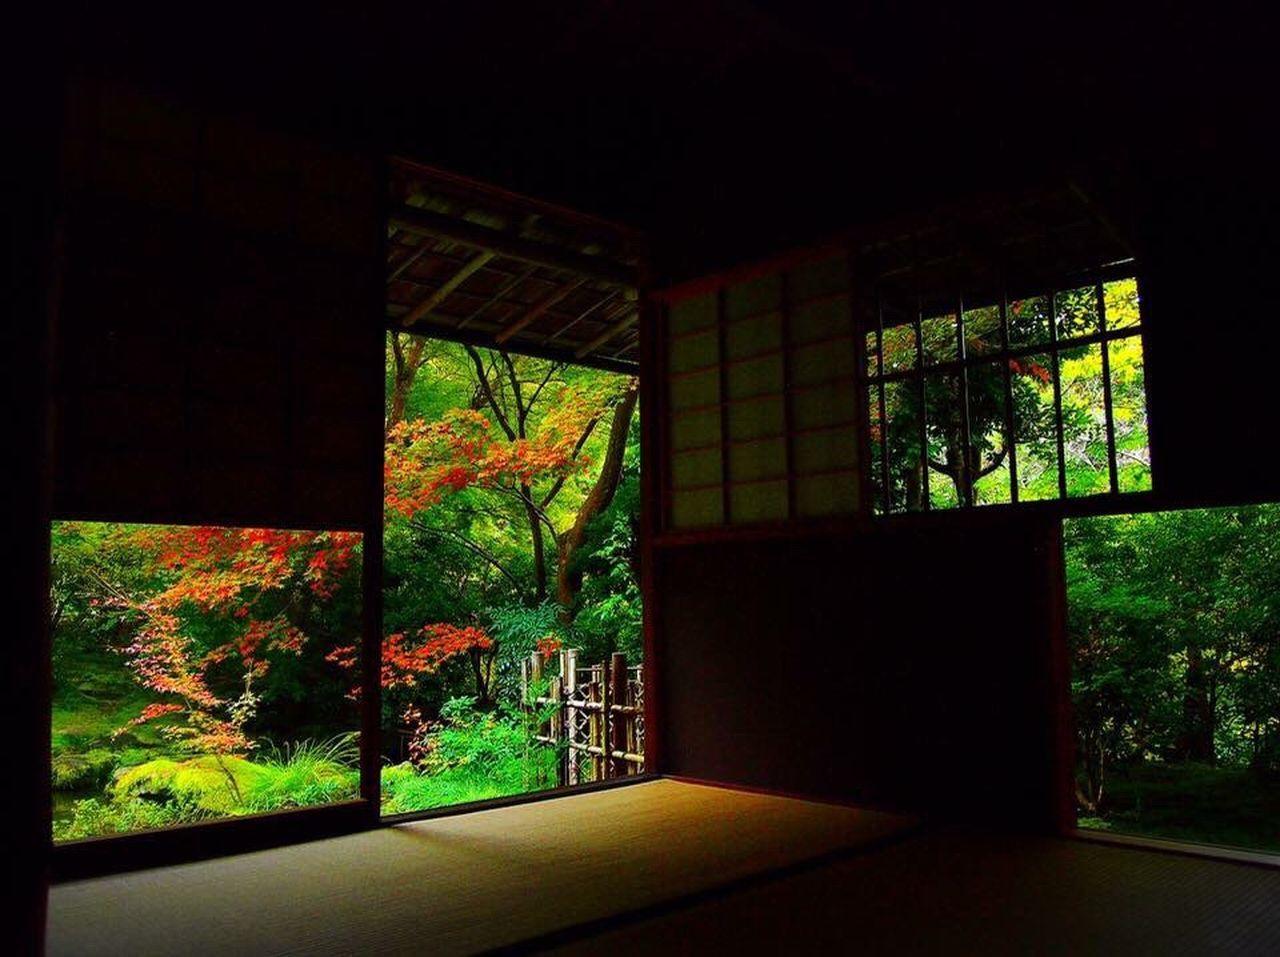 Kyoto Autumn 京都 日本 日本庭園 美しい ワビサビ 紅葉 風流 静か Kyoto Japan No People Plant Tree Beautiful Autumn Wabi-sabi Japanese Garden Nature Moss 自然 Temple